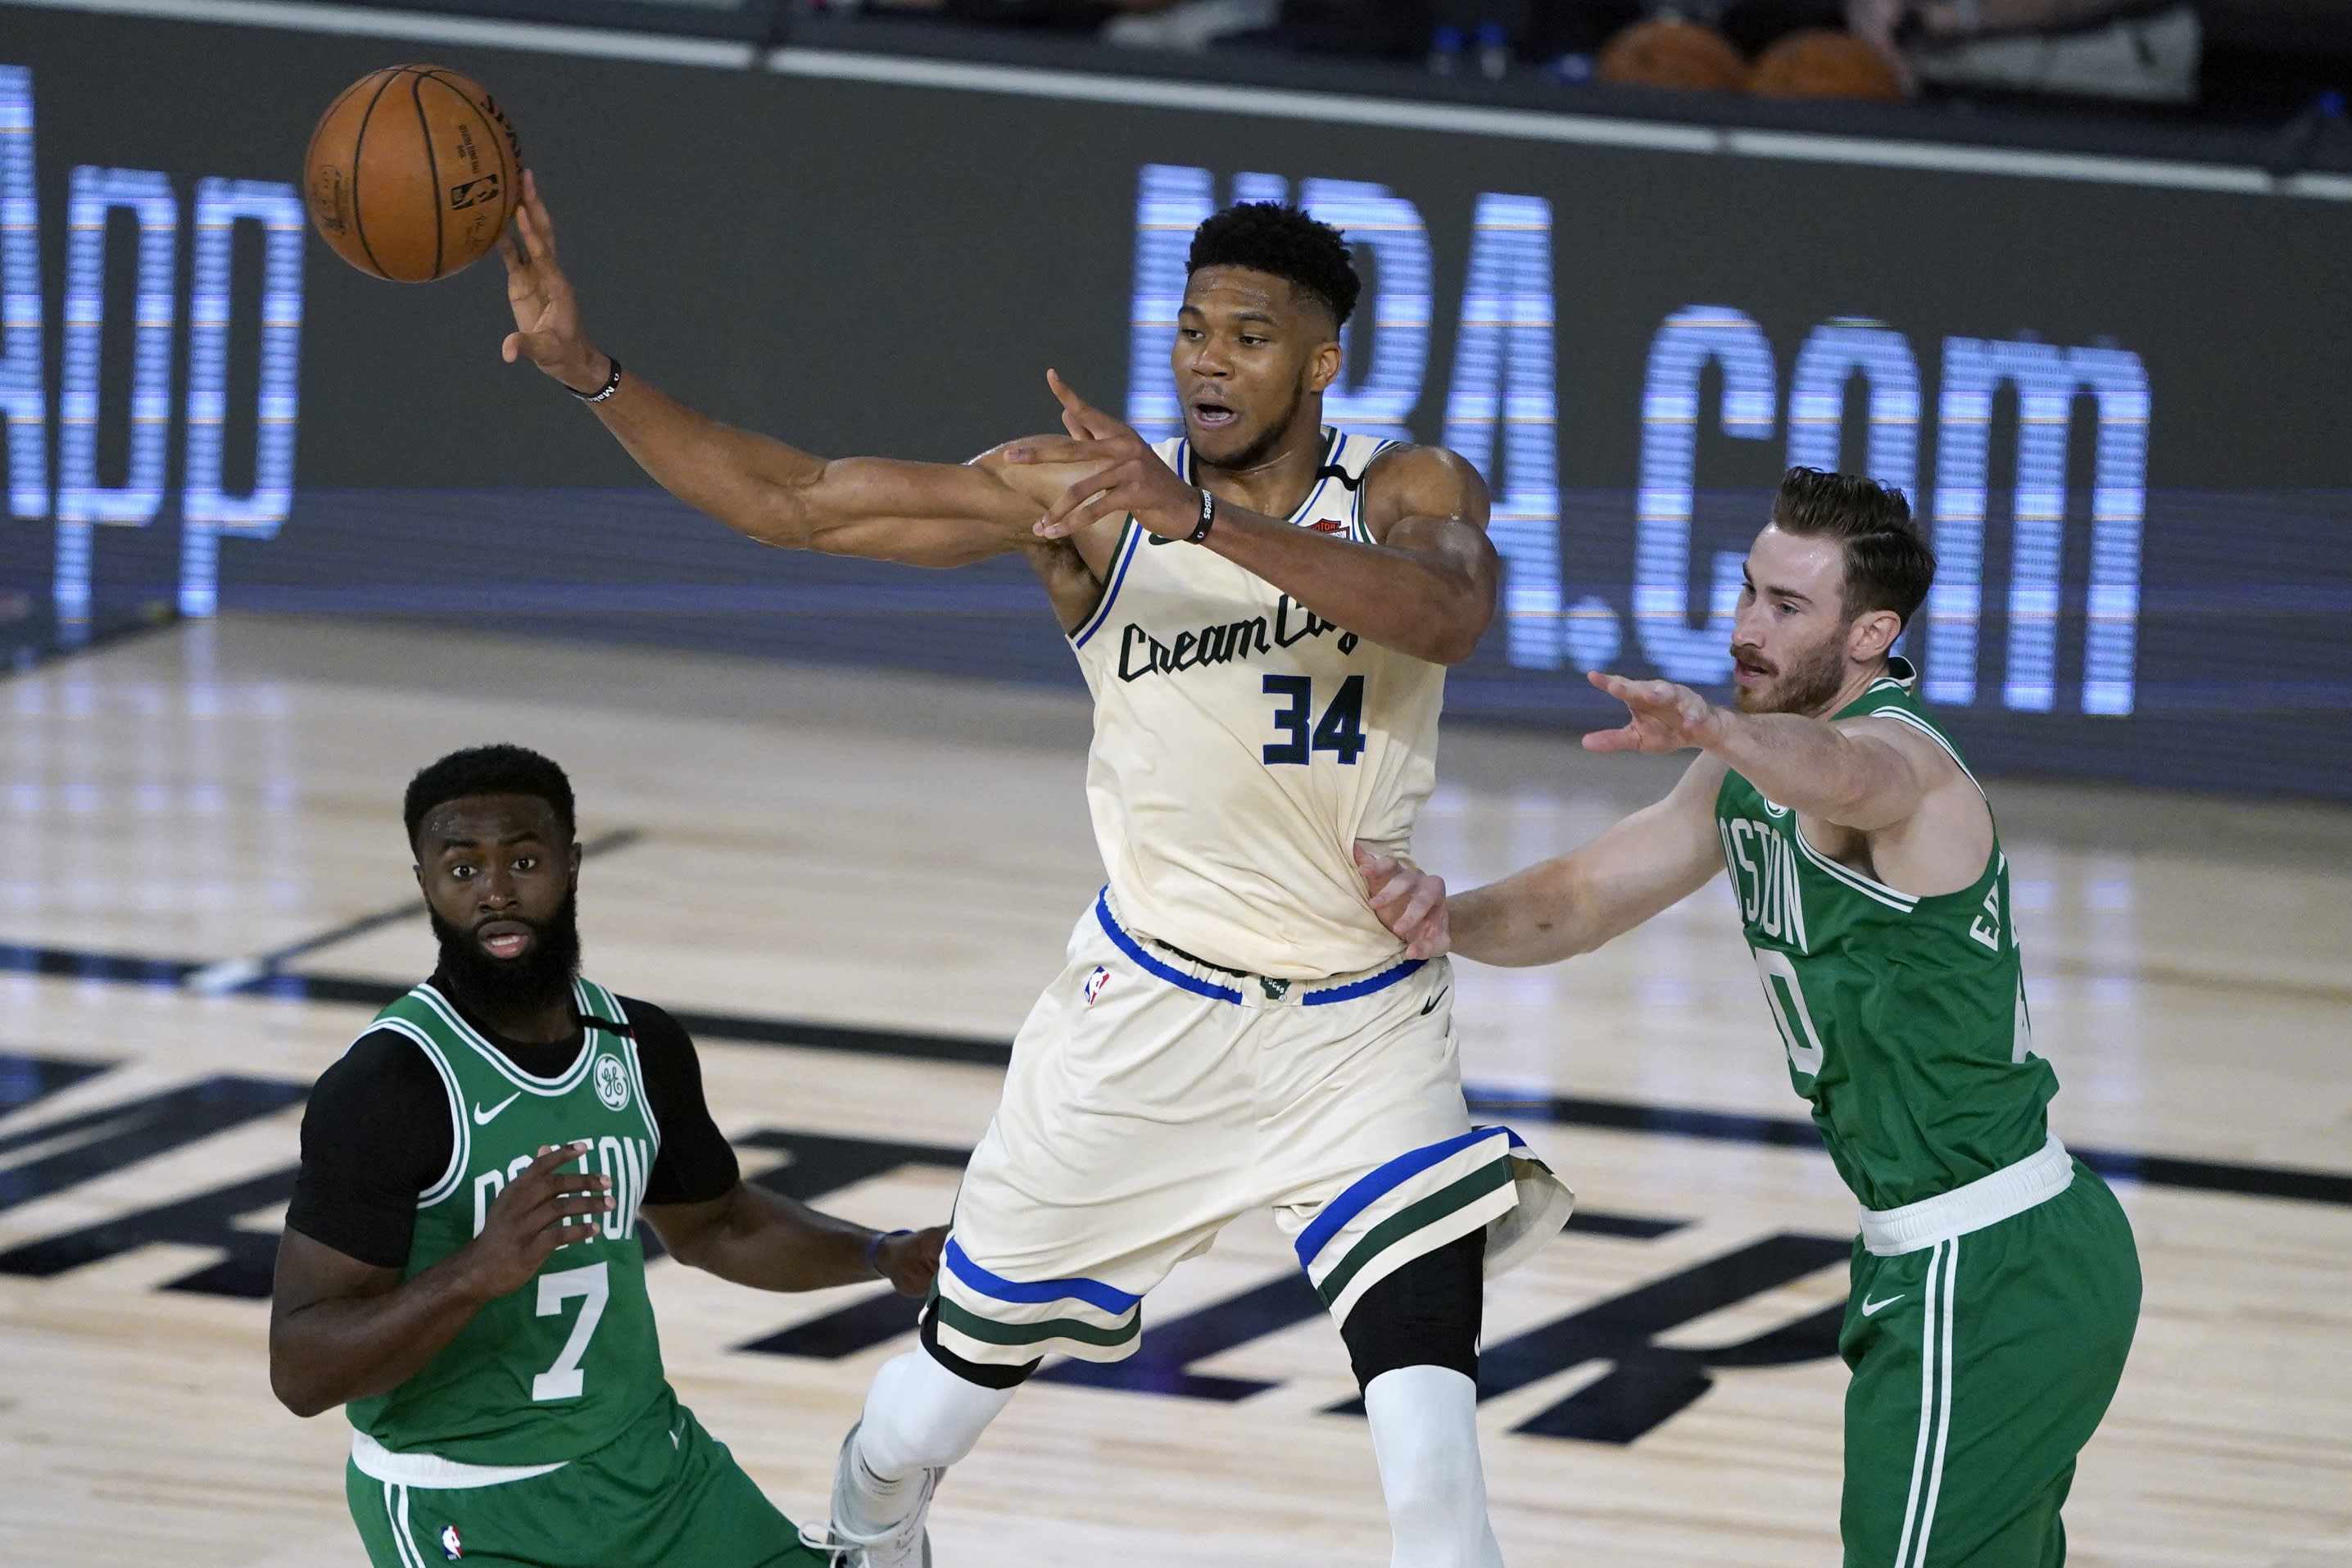 Milwaukee Bucks' Giannis Antetokounmpo (34) passes around Boston Celtics' Jaylen Brown (7) and Gordon Hayward during the first half of an NBA basketball game Friday, July 31, 2020, in Lake Buena Vista, Fla. (AP Photo/Ashley Landis, Pool)